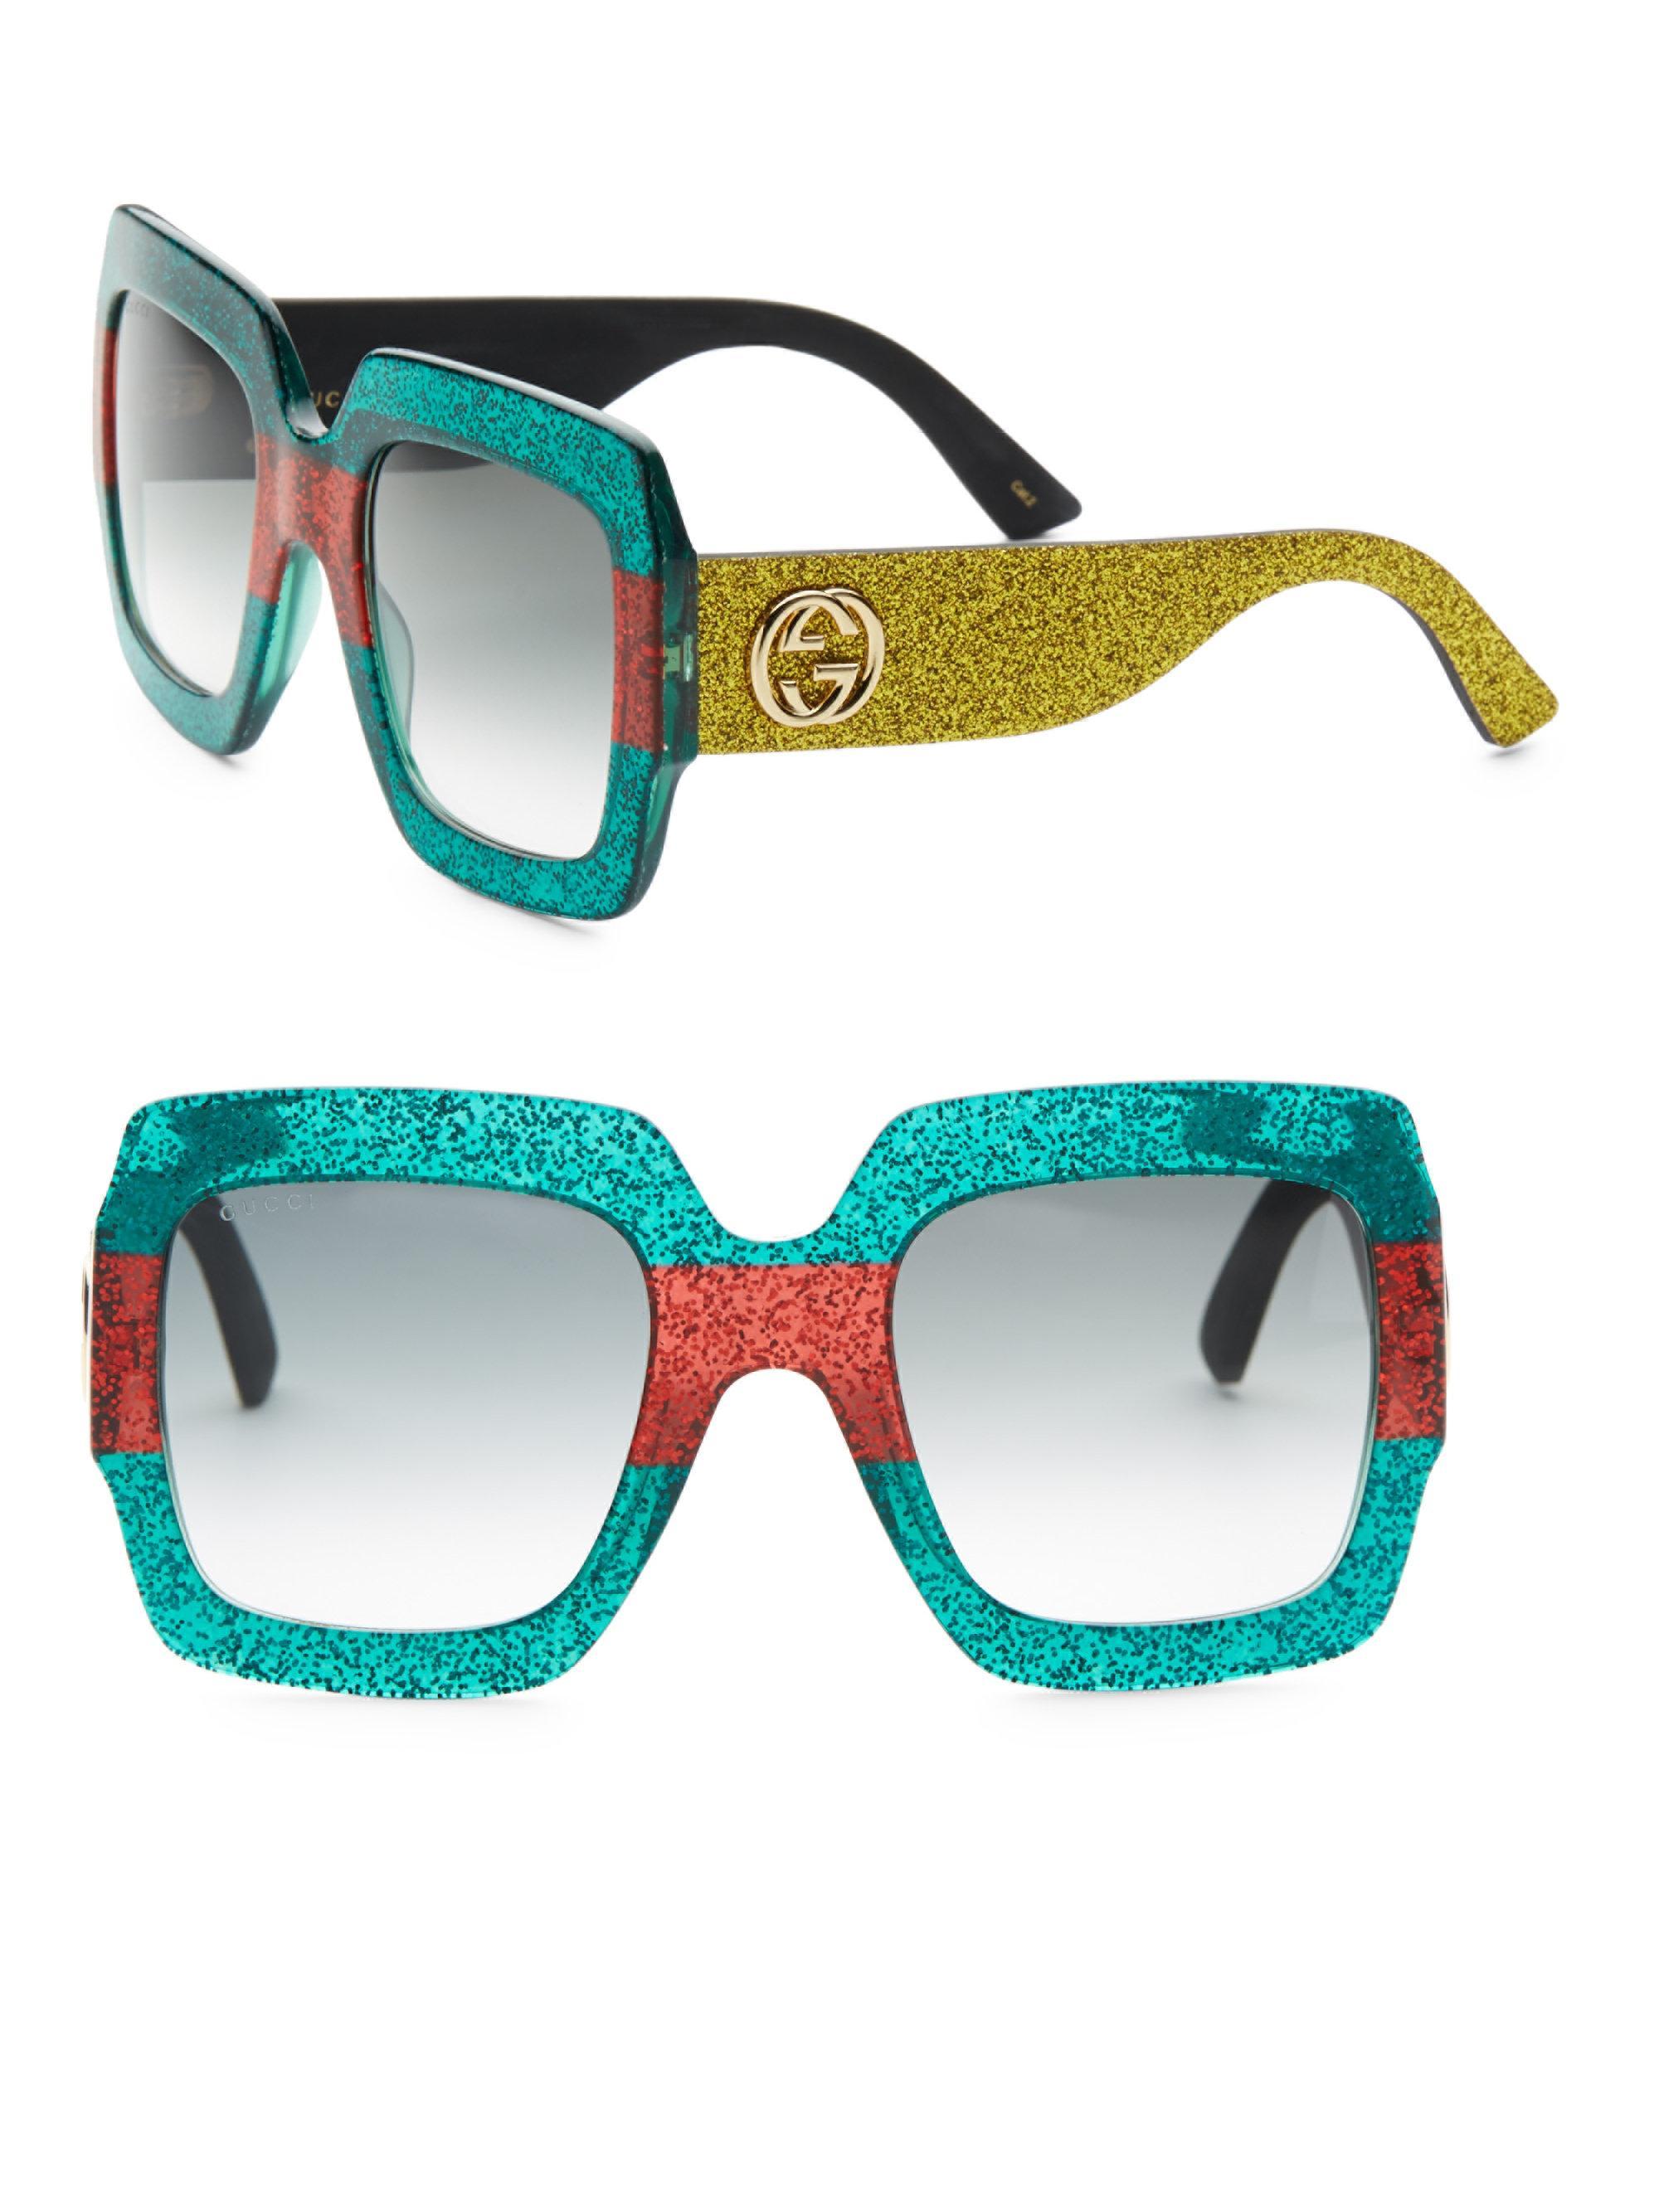 3b3c30136c4 Gucci Oversized Square Sunglasses Glitter - Image Of Glasses